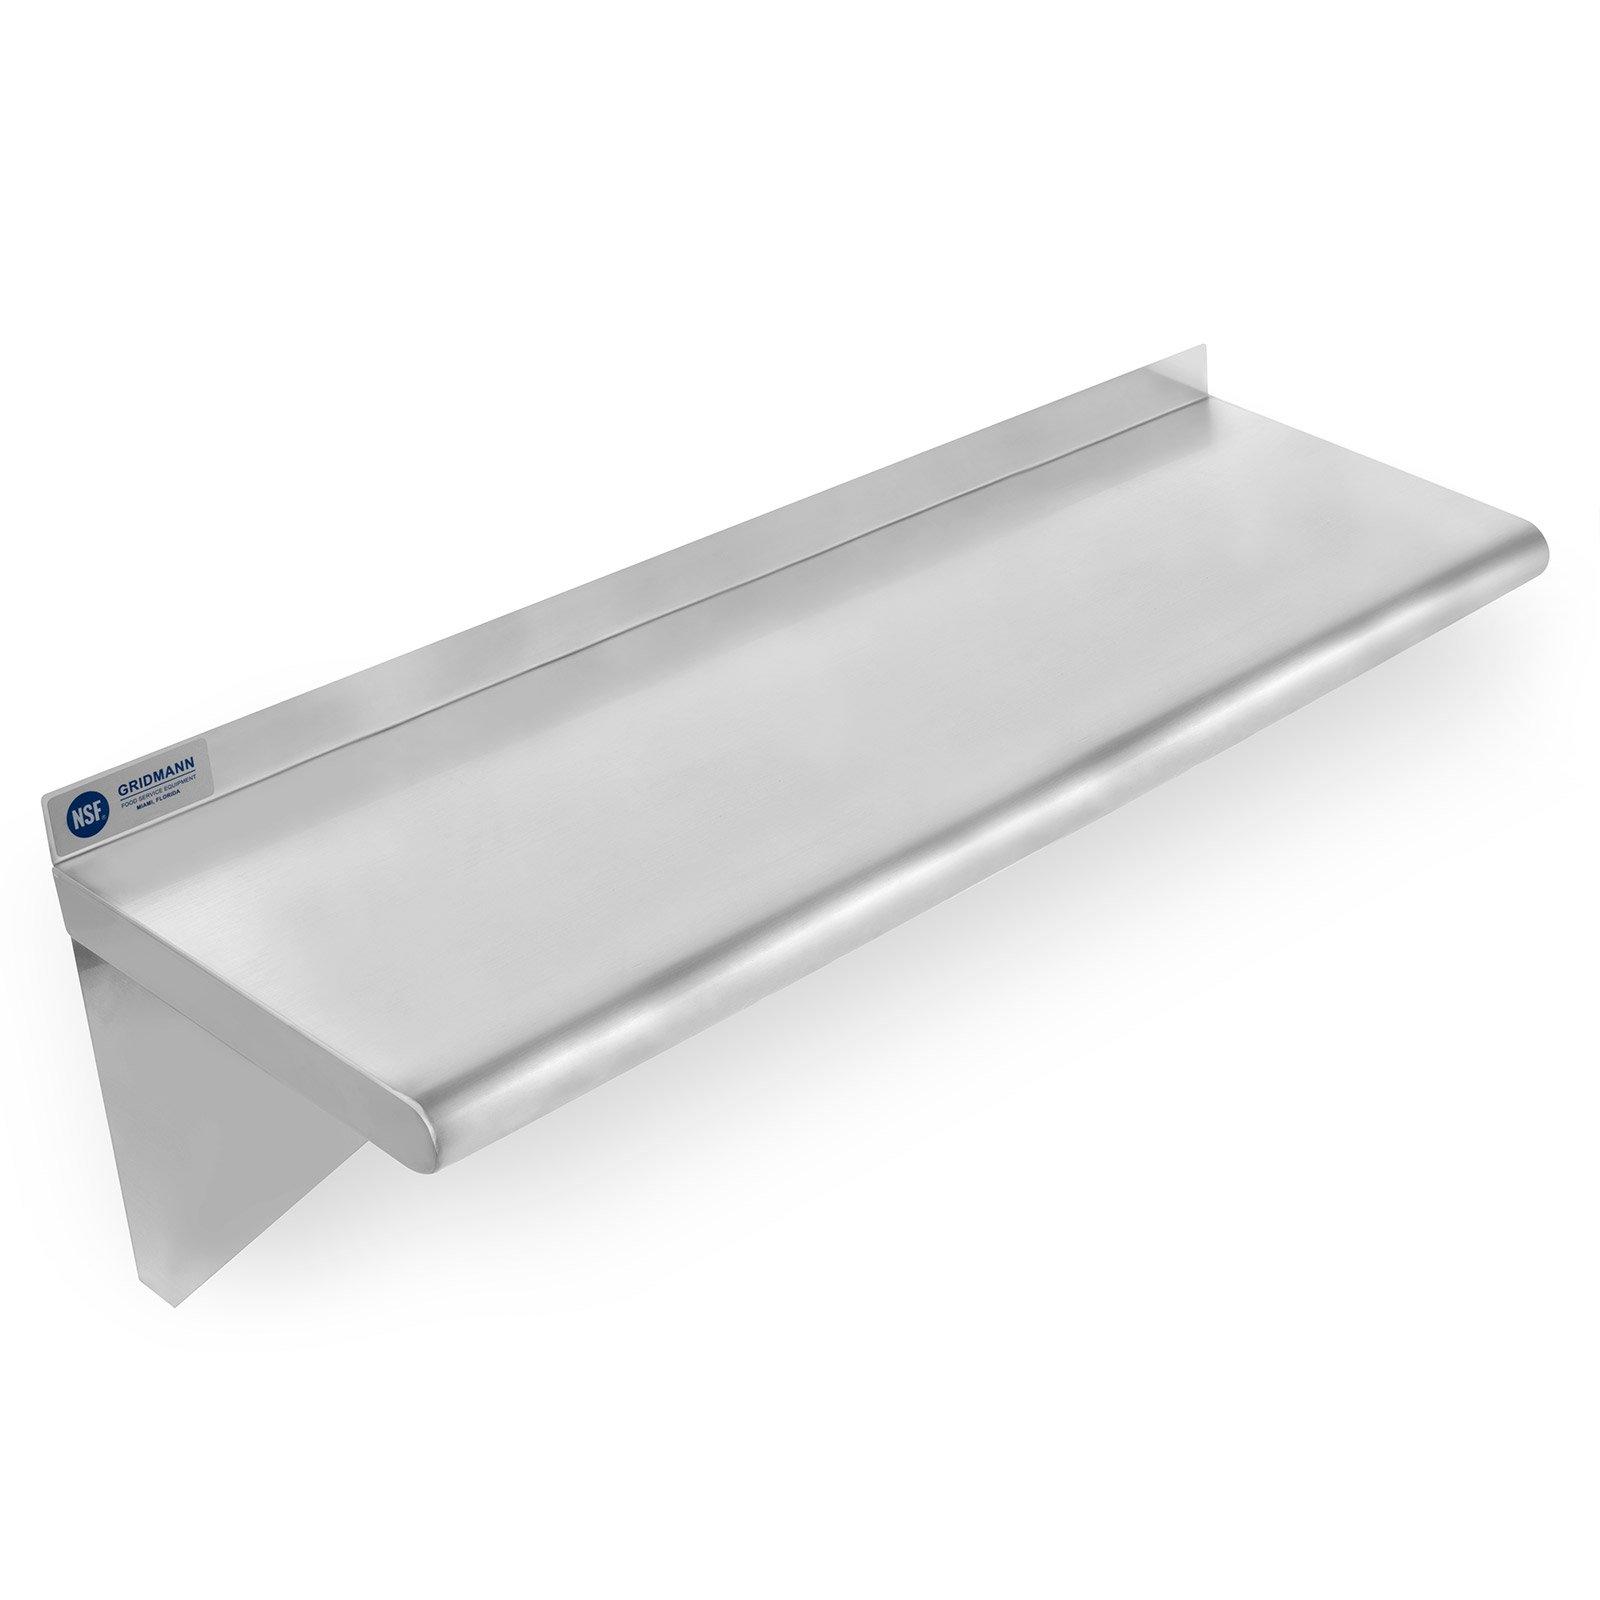 Gridmann NSF Stainless Steel Kitchen Wall Mount Shelf Commercial Restaurant Bar w/ Backsplash - 14'' x 36''